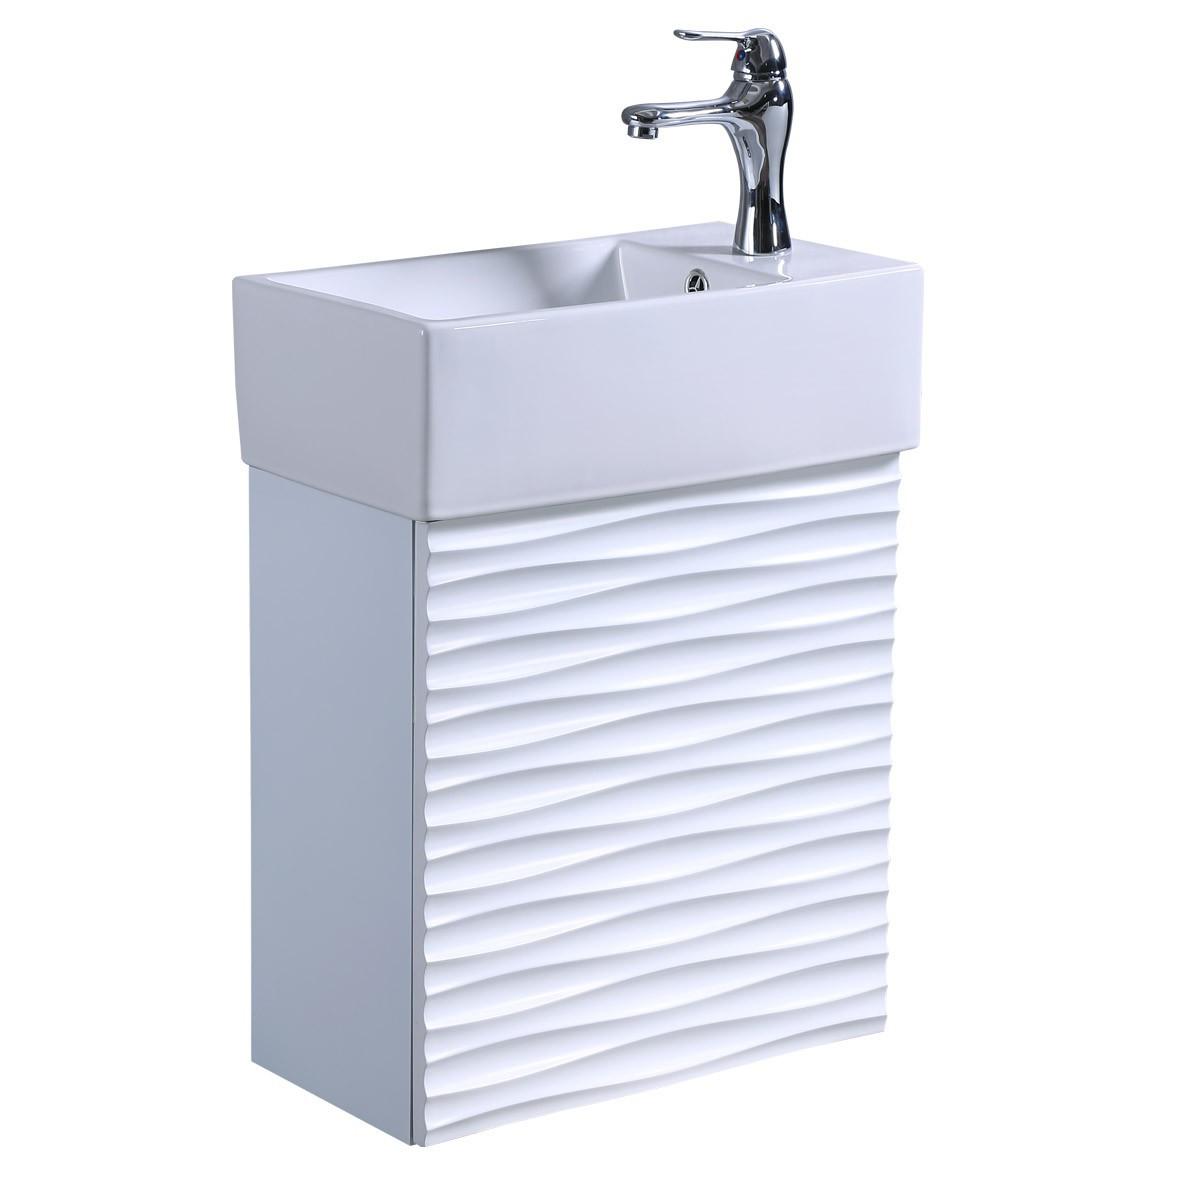 ... U003cPREu003eRenovatoru0027s Supply Small White Rippled Bathroom Vanity Cabinet ...